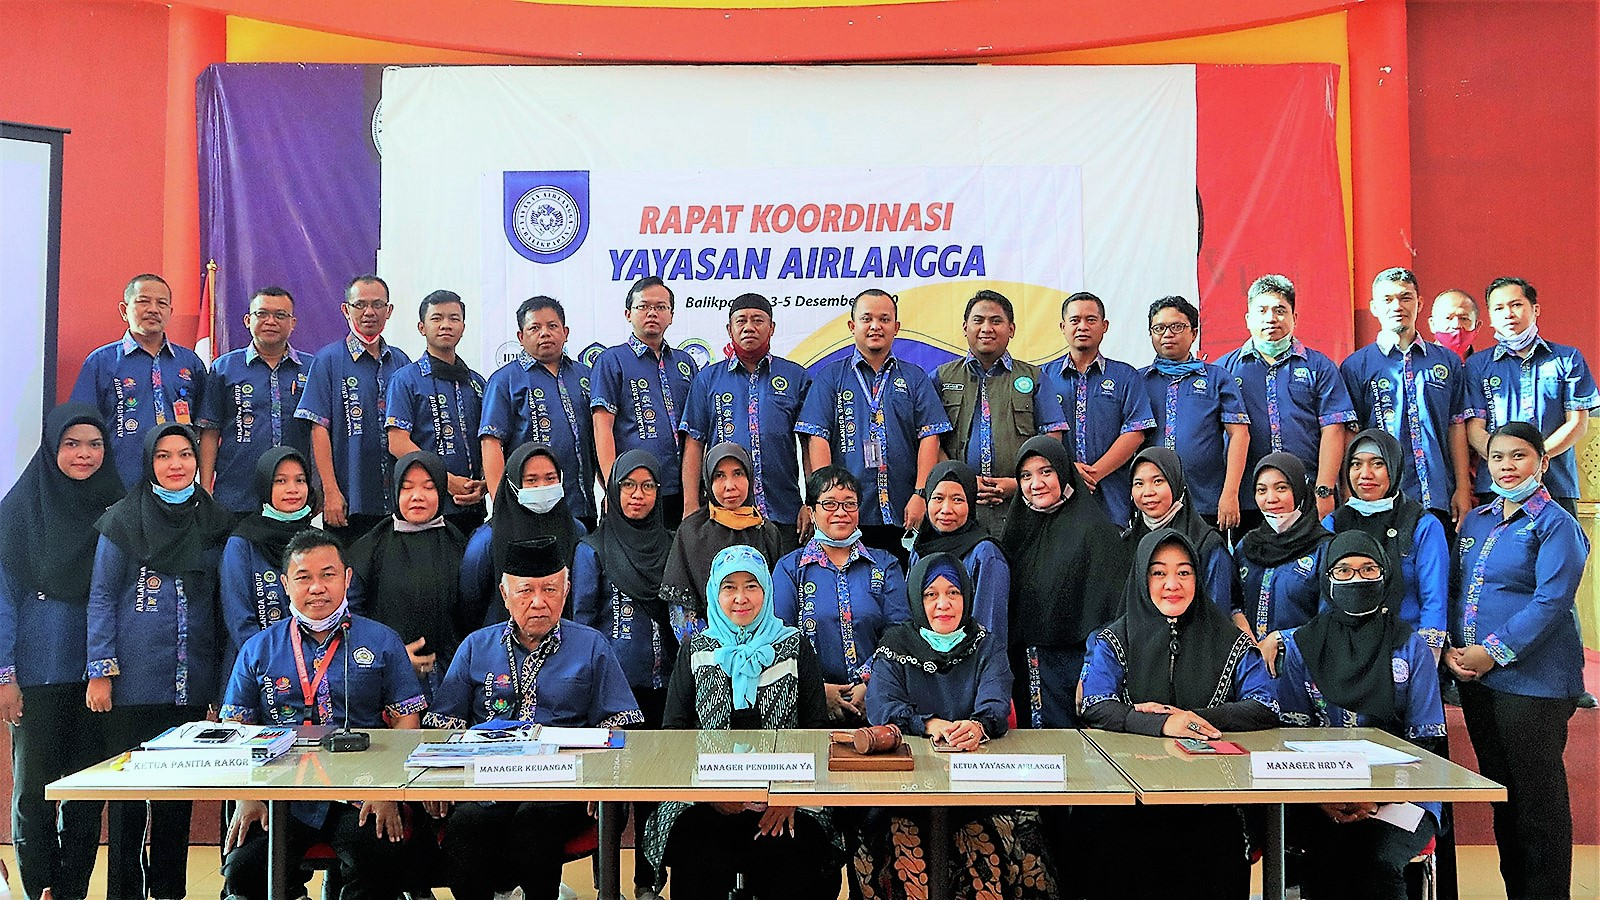 Foto bersama peserta Rapat Koordinasi Devisi Pendidikan Menengah bersama Pengurus Yayasan Airlangga di Aula Kampus Cheng Ho Universitas Mulia, Kamis (3/12). Foto: Media Kreatif